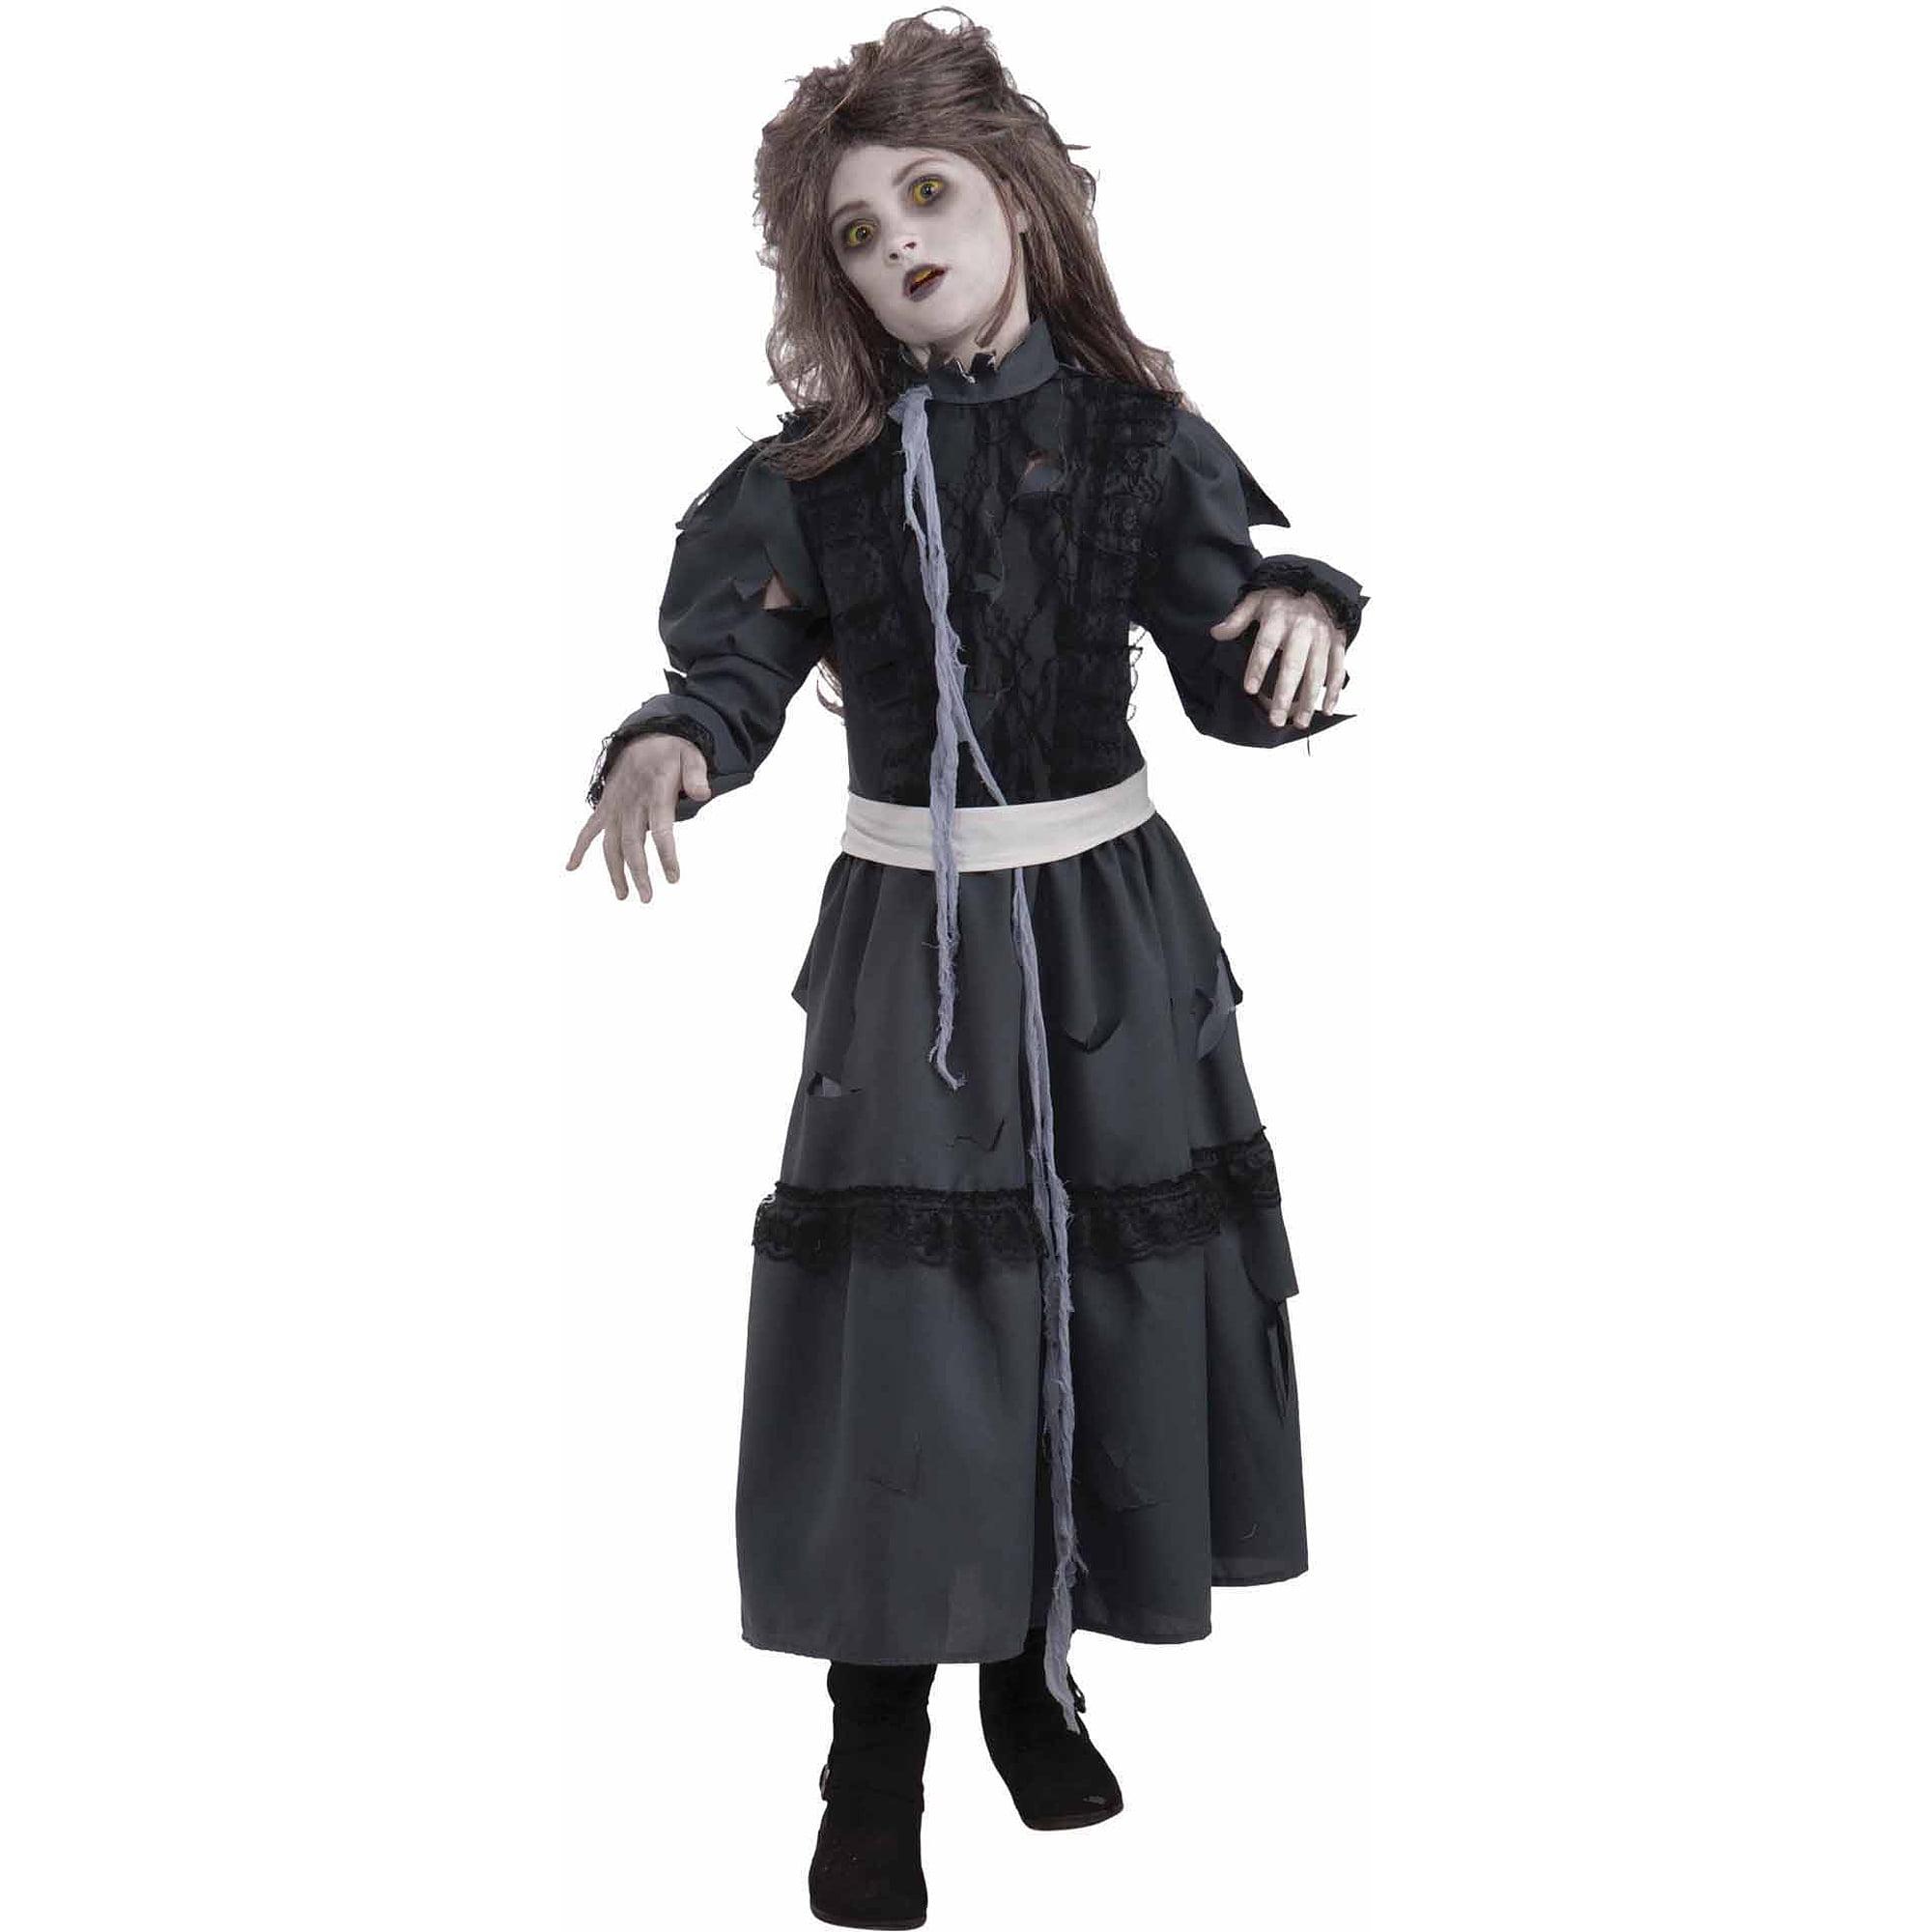 sc 1 st  Walmart & Zombie Girl Child Halloween Costume - Walmart.com